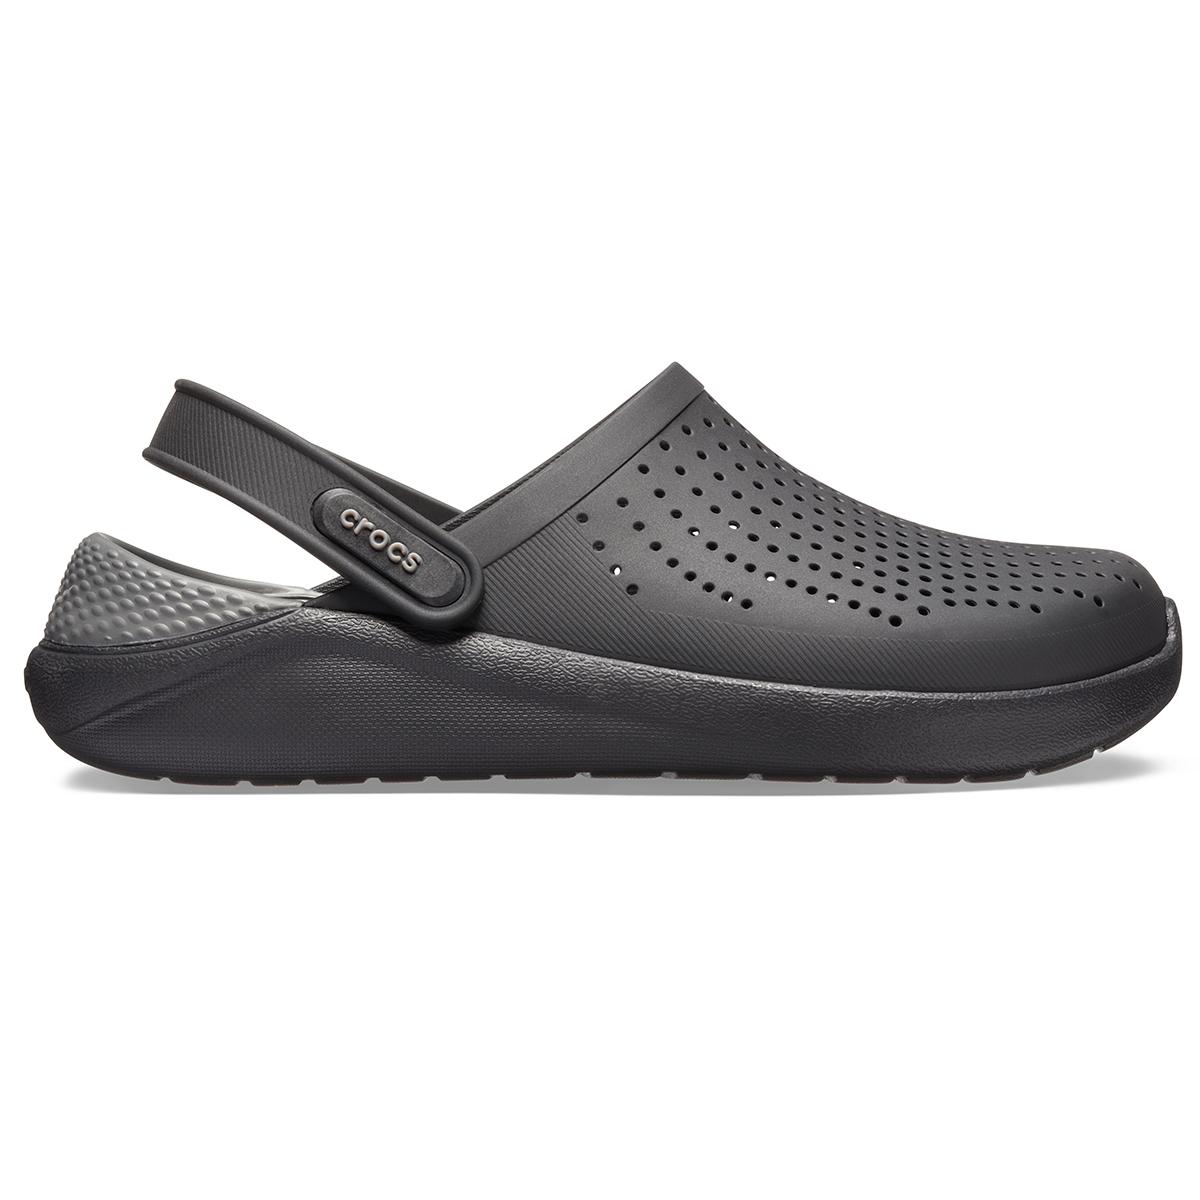 Crocs LiteRide Clog - Siyah/Barut Rengi